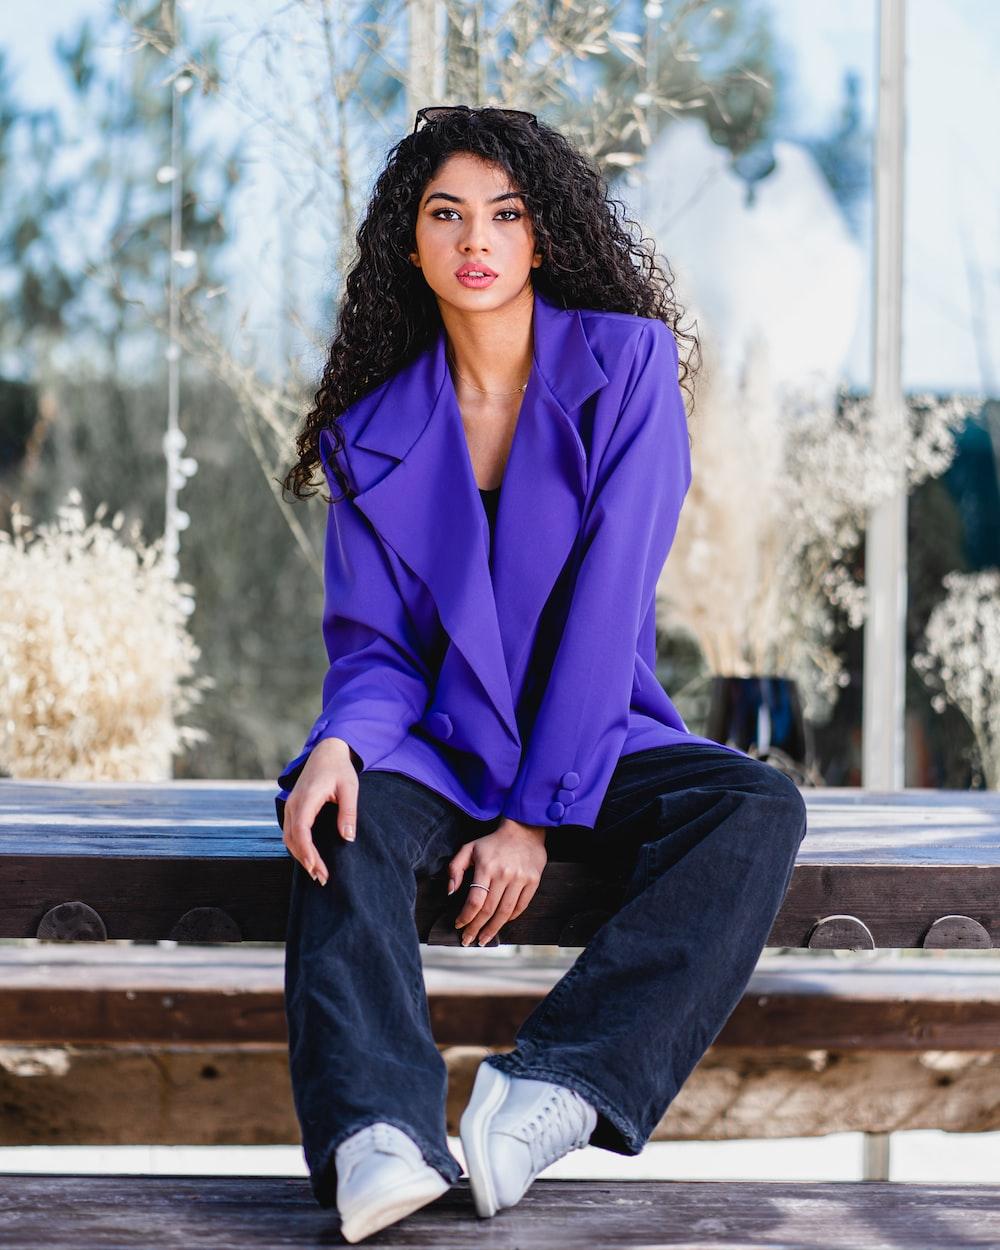 woman in purple blazer sitting on brown wooden bench during daytime